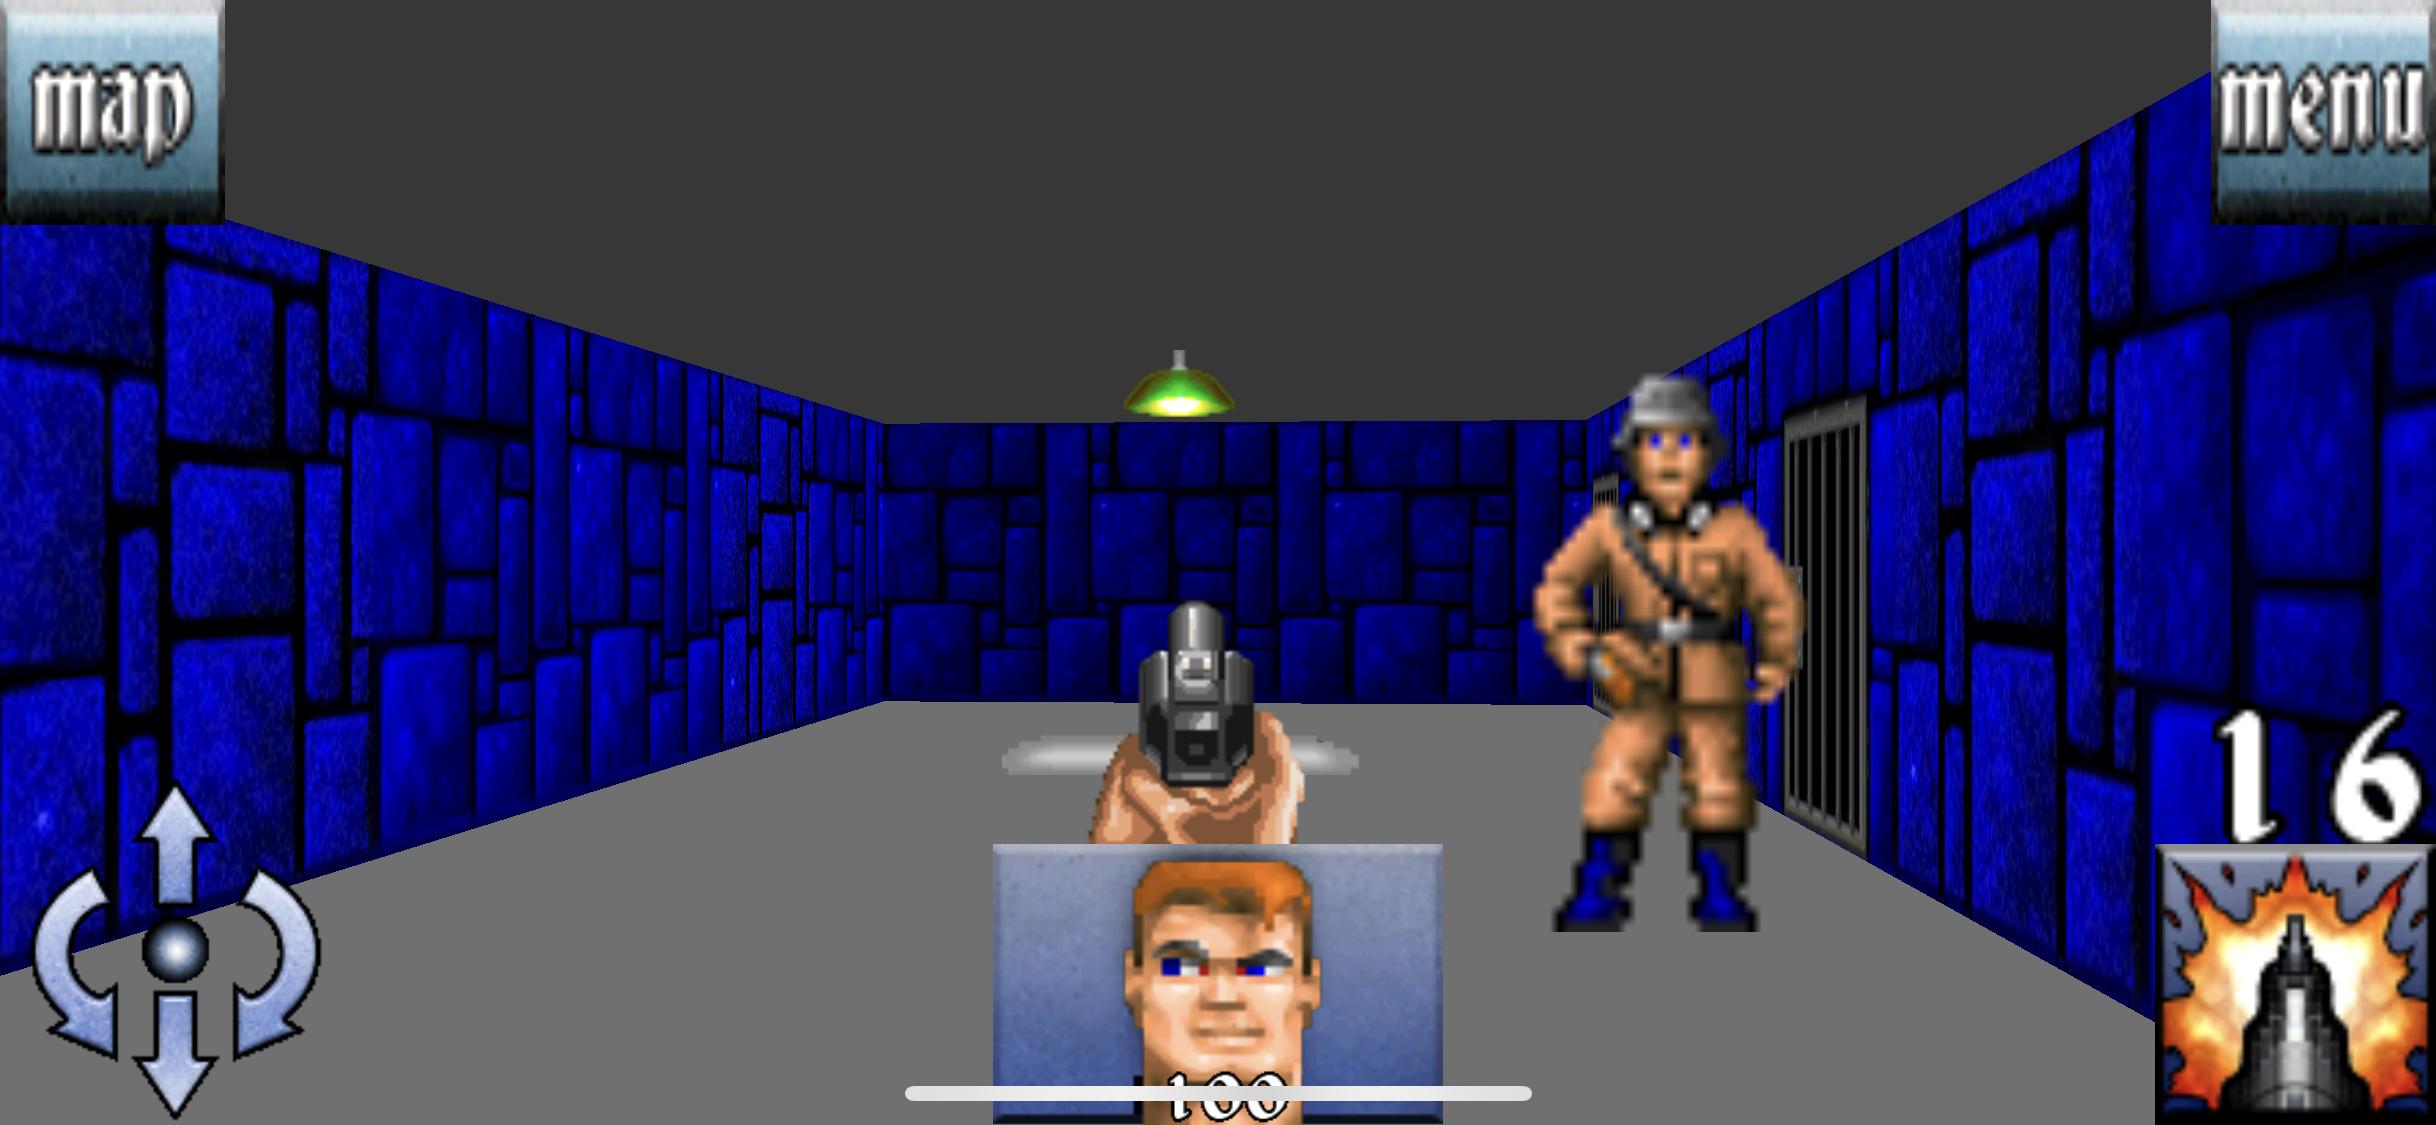 Wolfenstein 3D and DOOM on iOS 11 – schnapple com